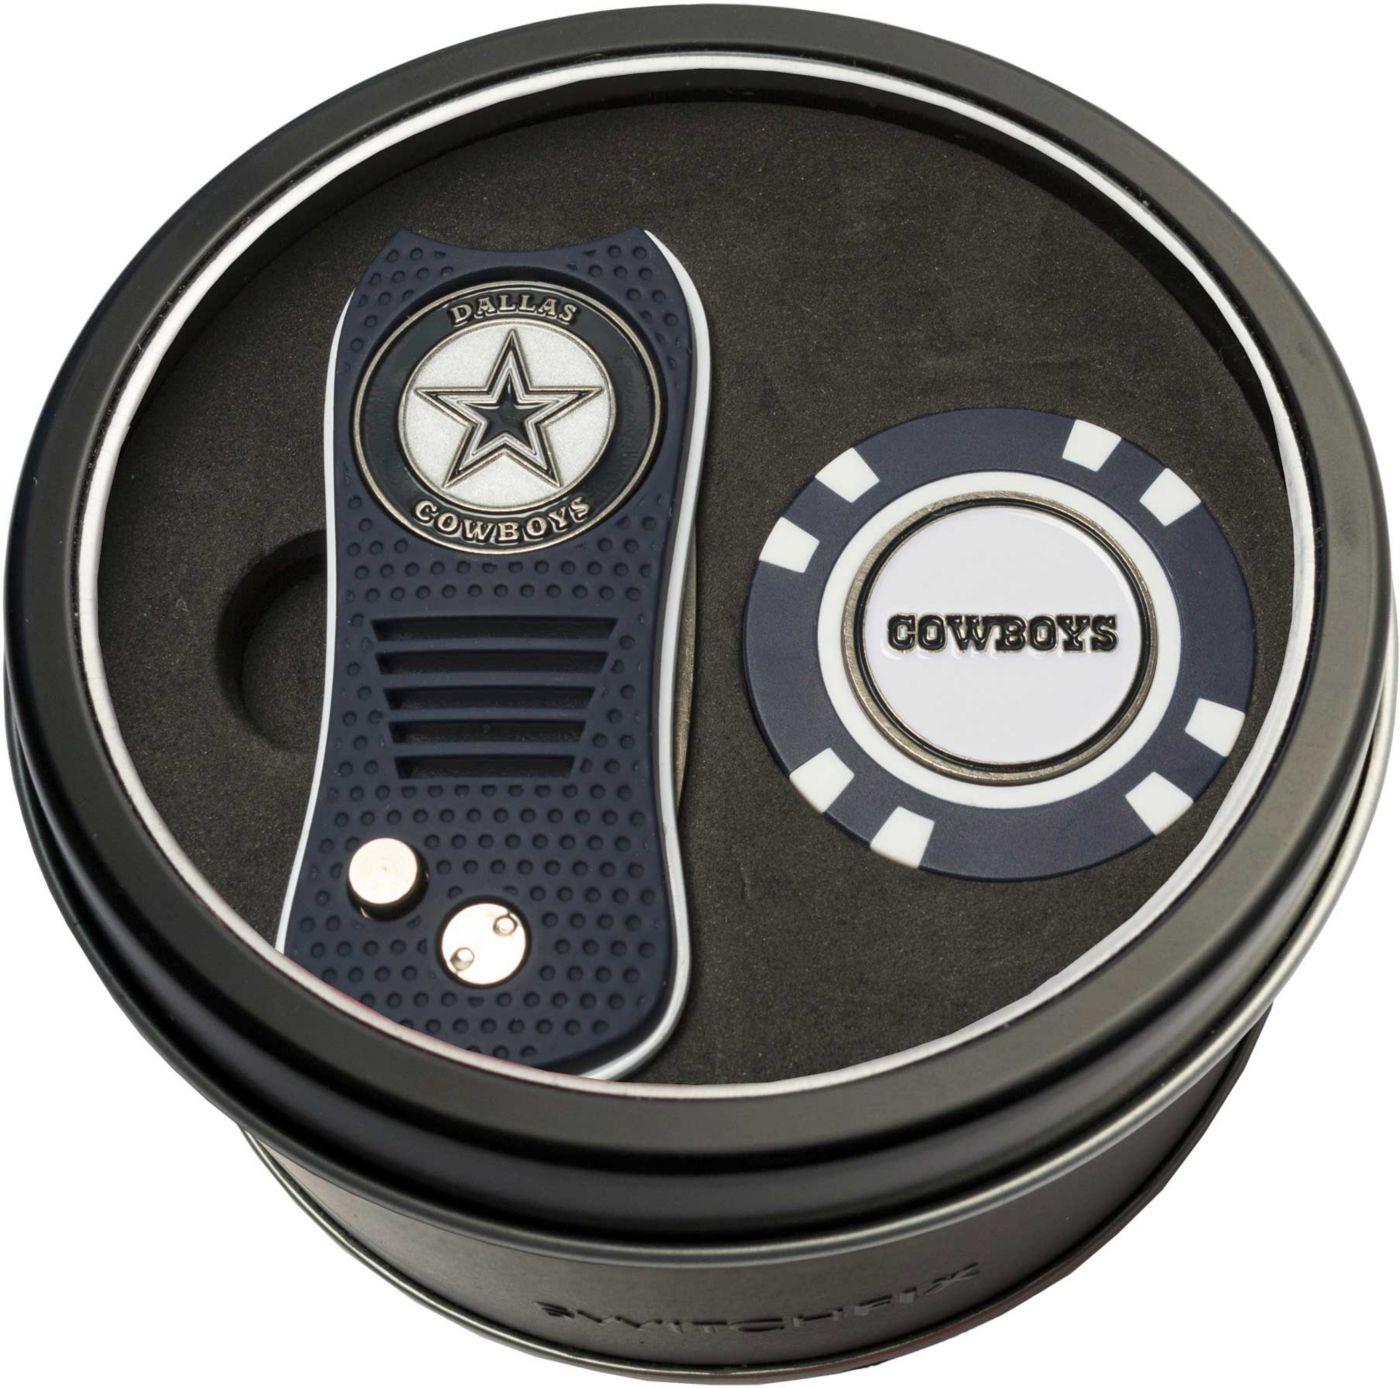 Team Golf Dallas Cowboys Switchfix Divot Tool and Poker Chip Ball Marker Set